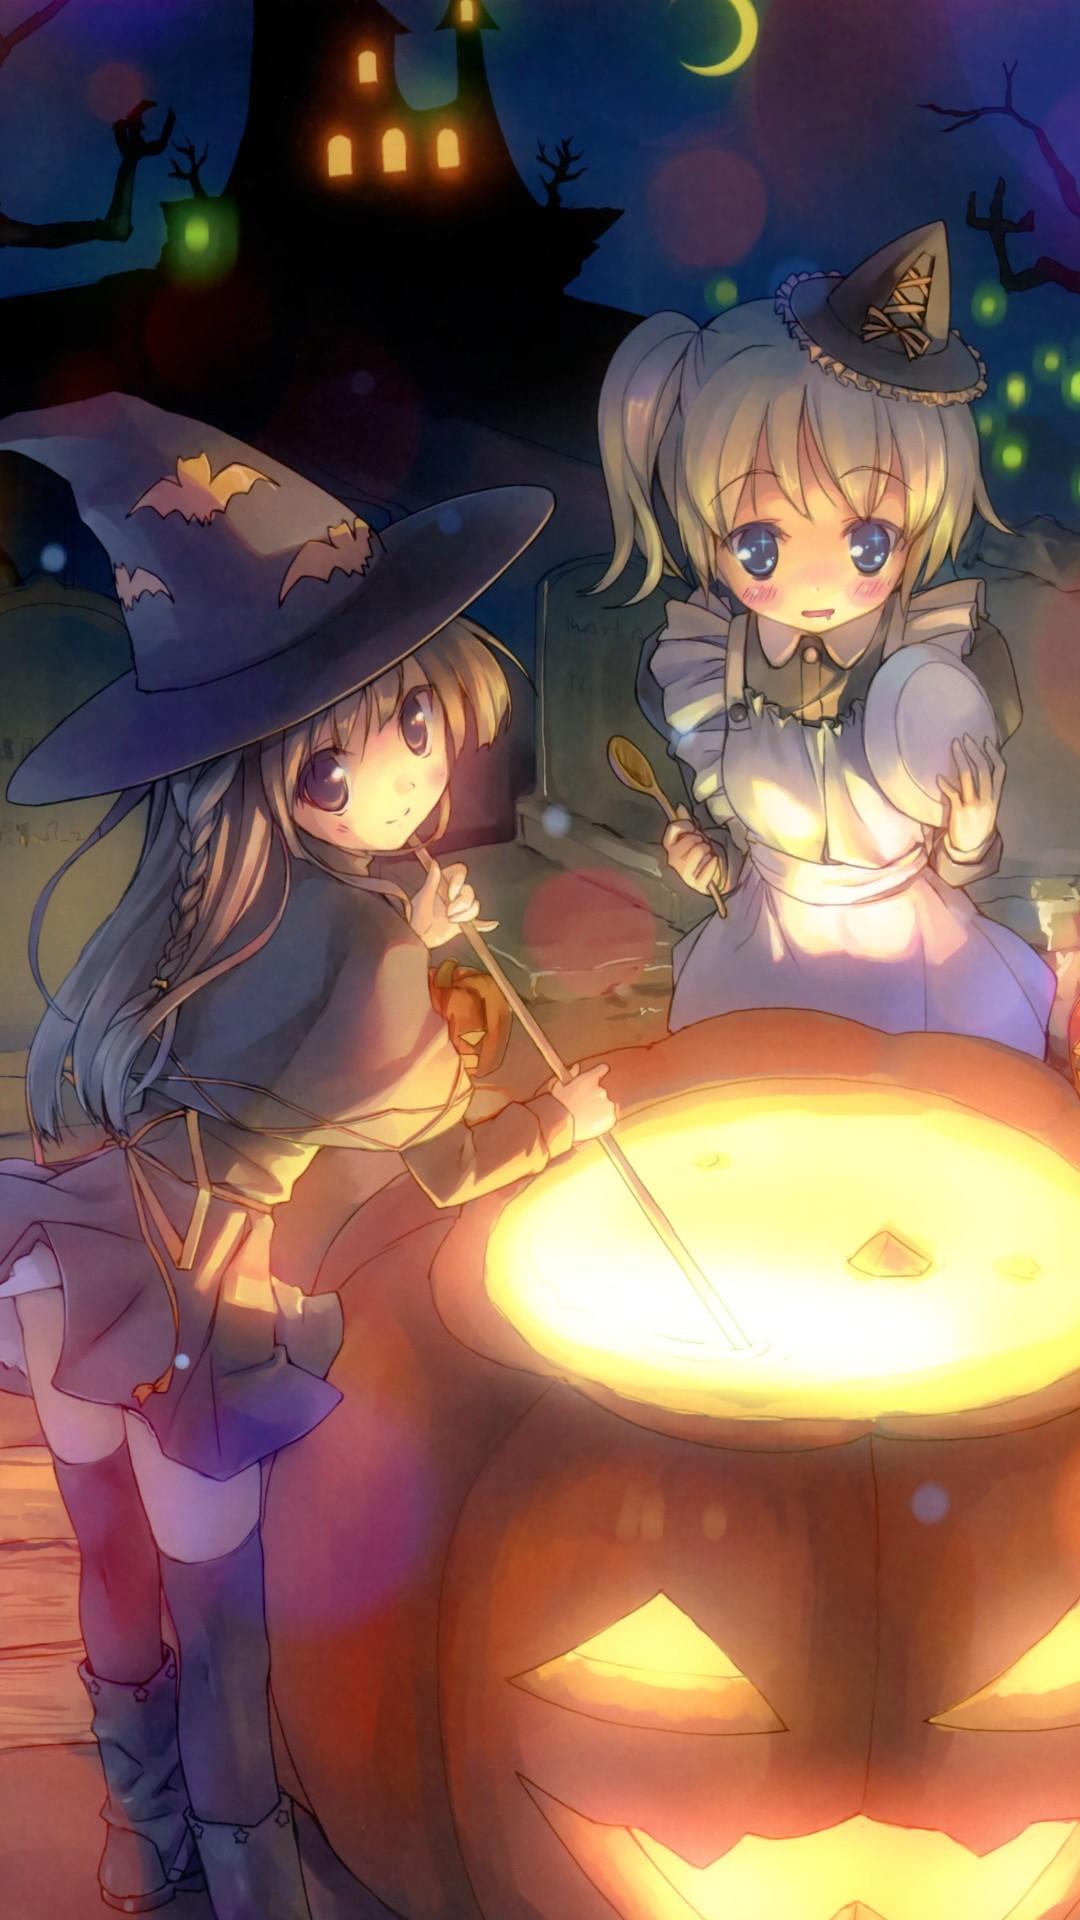 Anime Halloween 2013.Magic THL W9 wallpaper.1080×1920